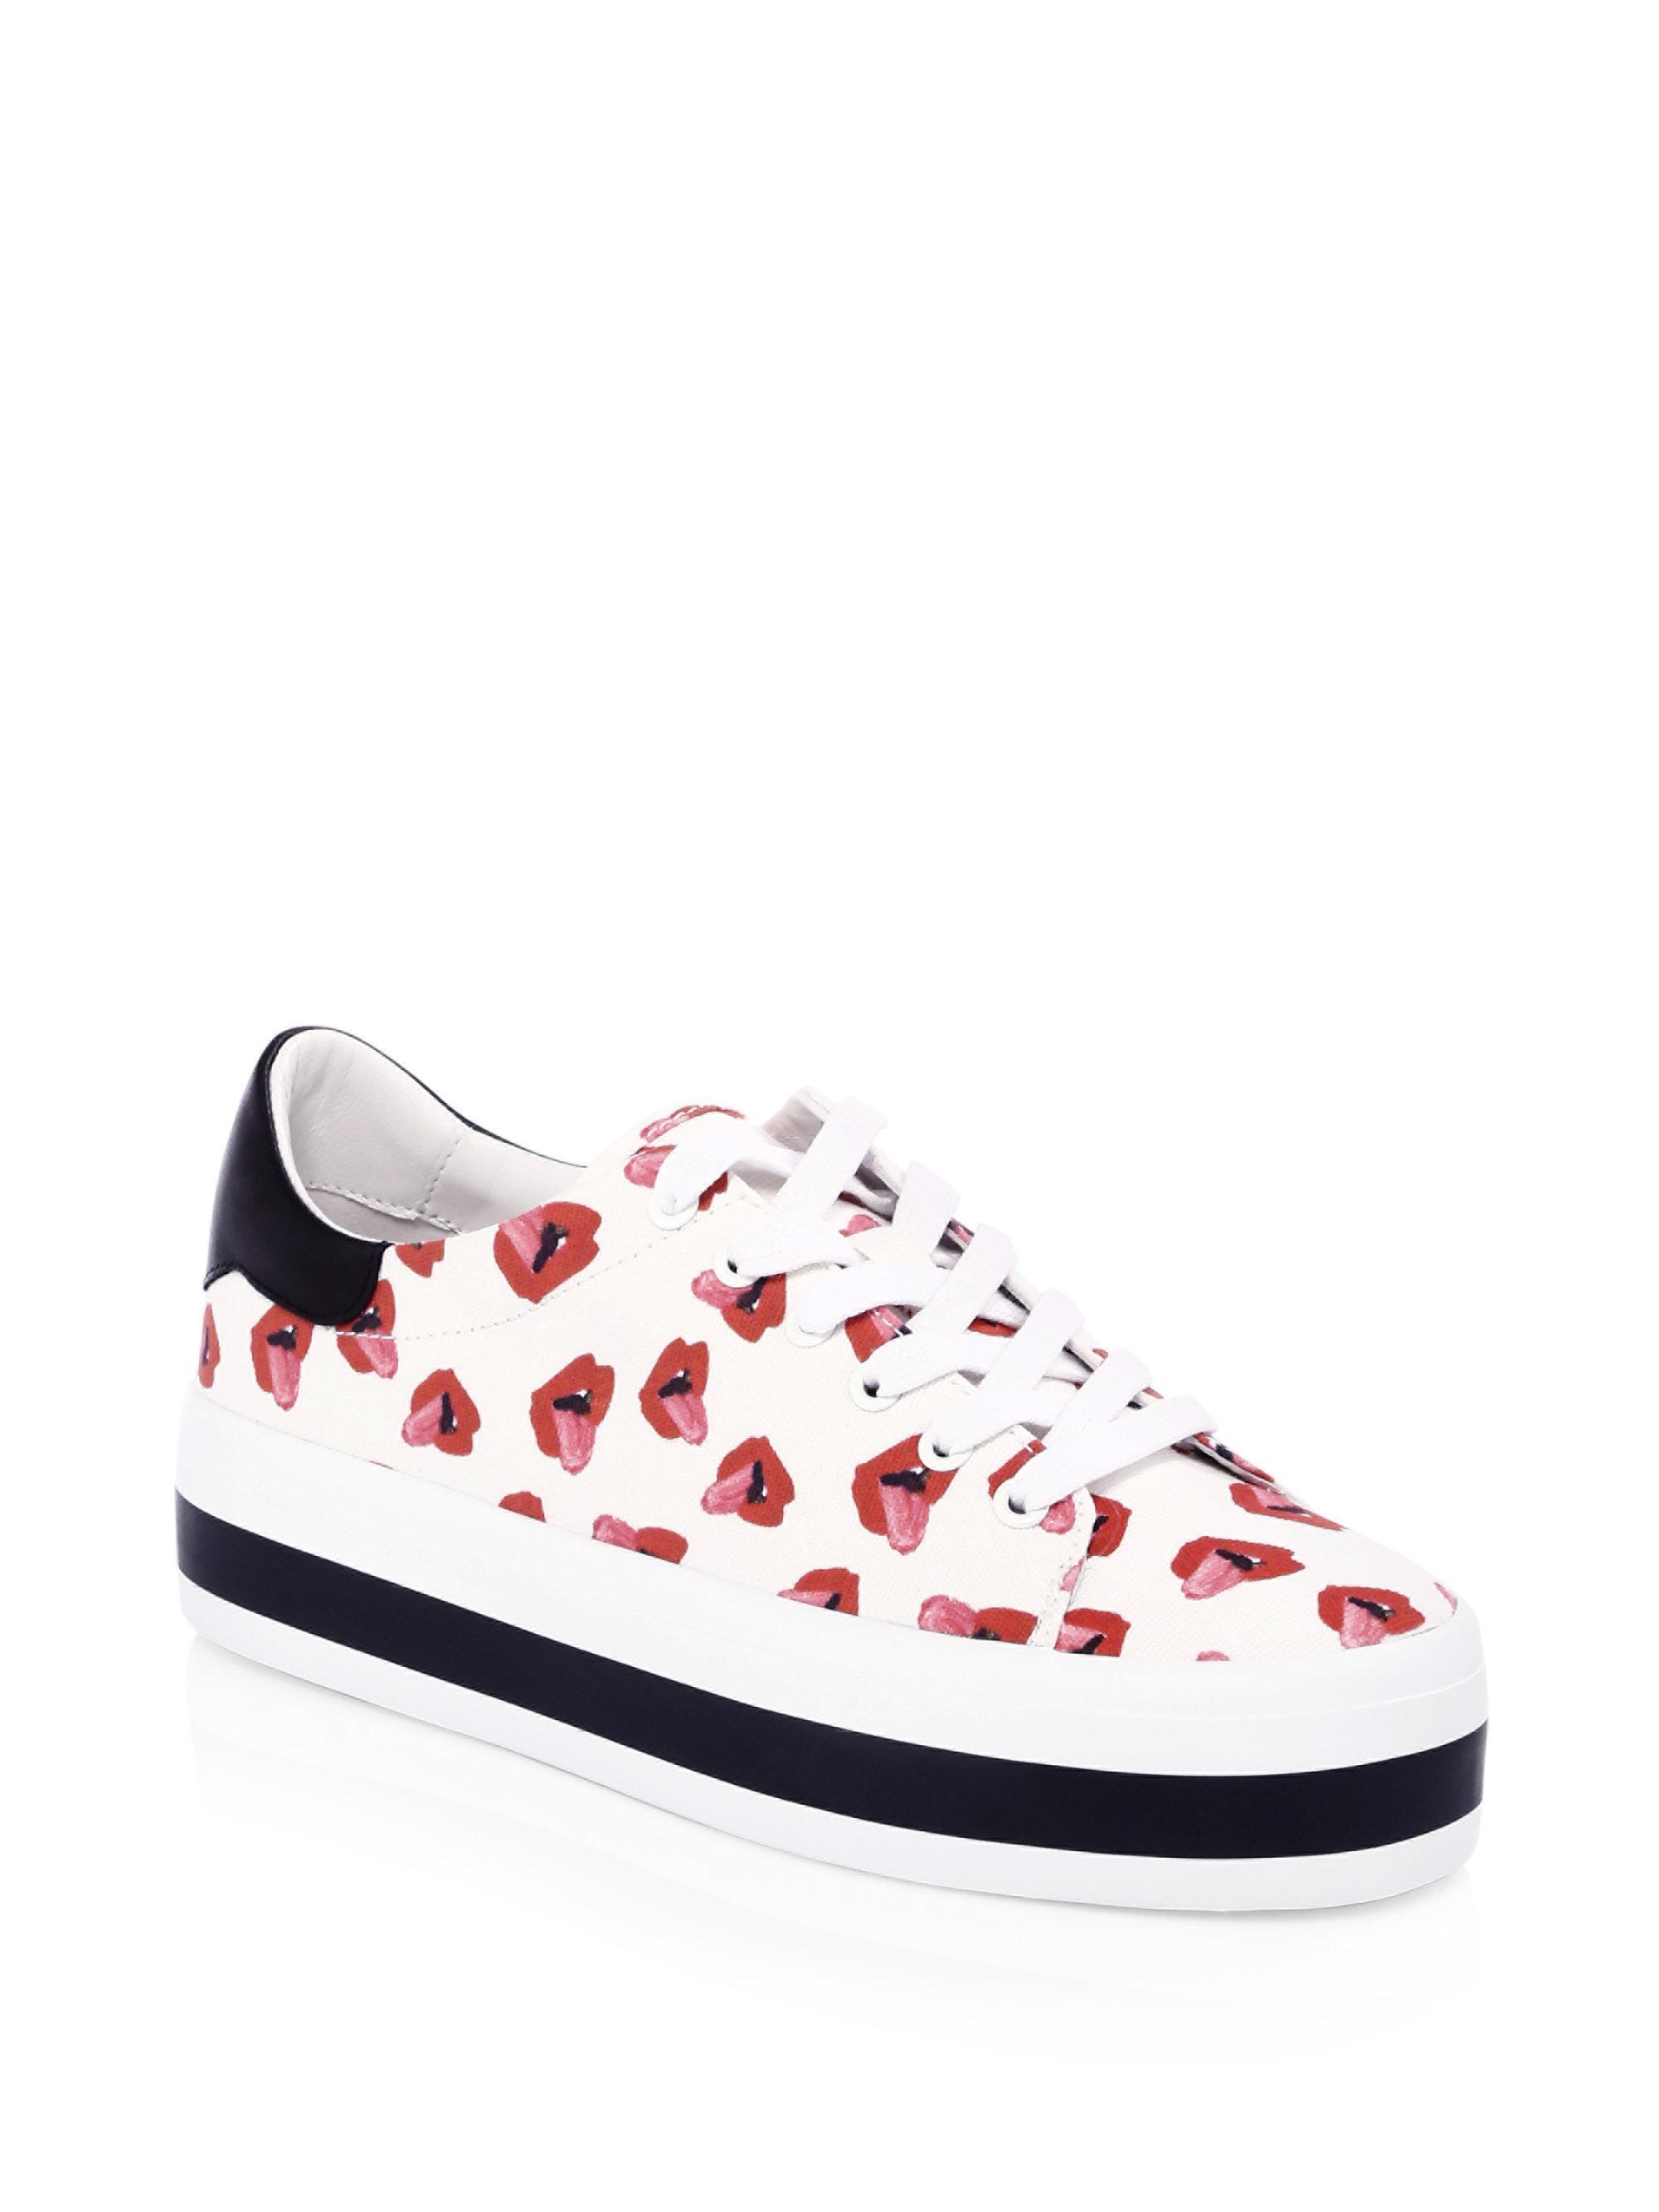 ALICE+OLIVIA Donald Robertson Collaboration Ezra Canvas Sneakers